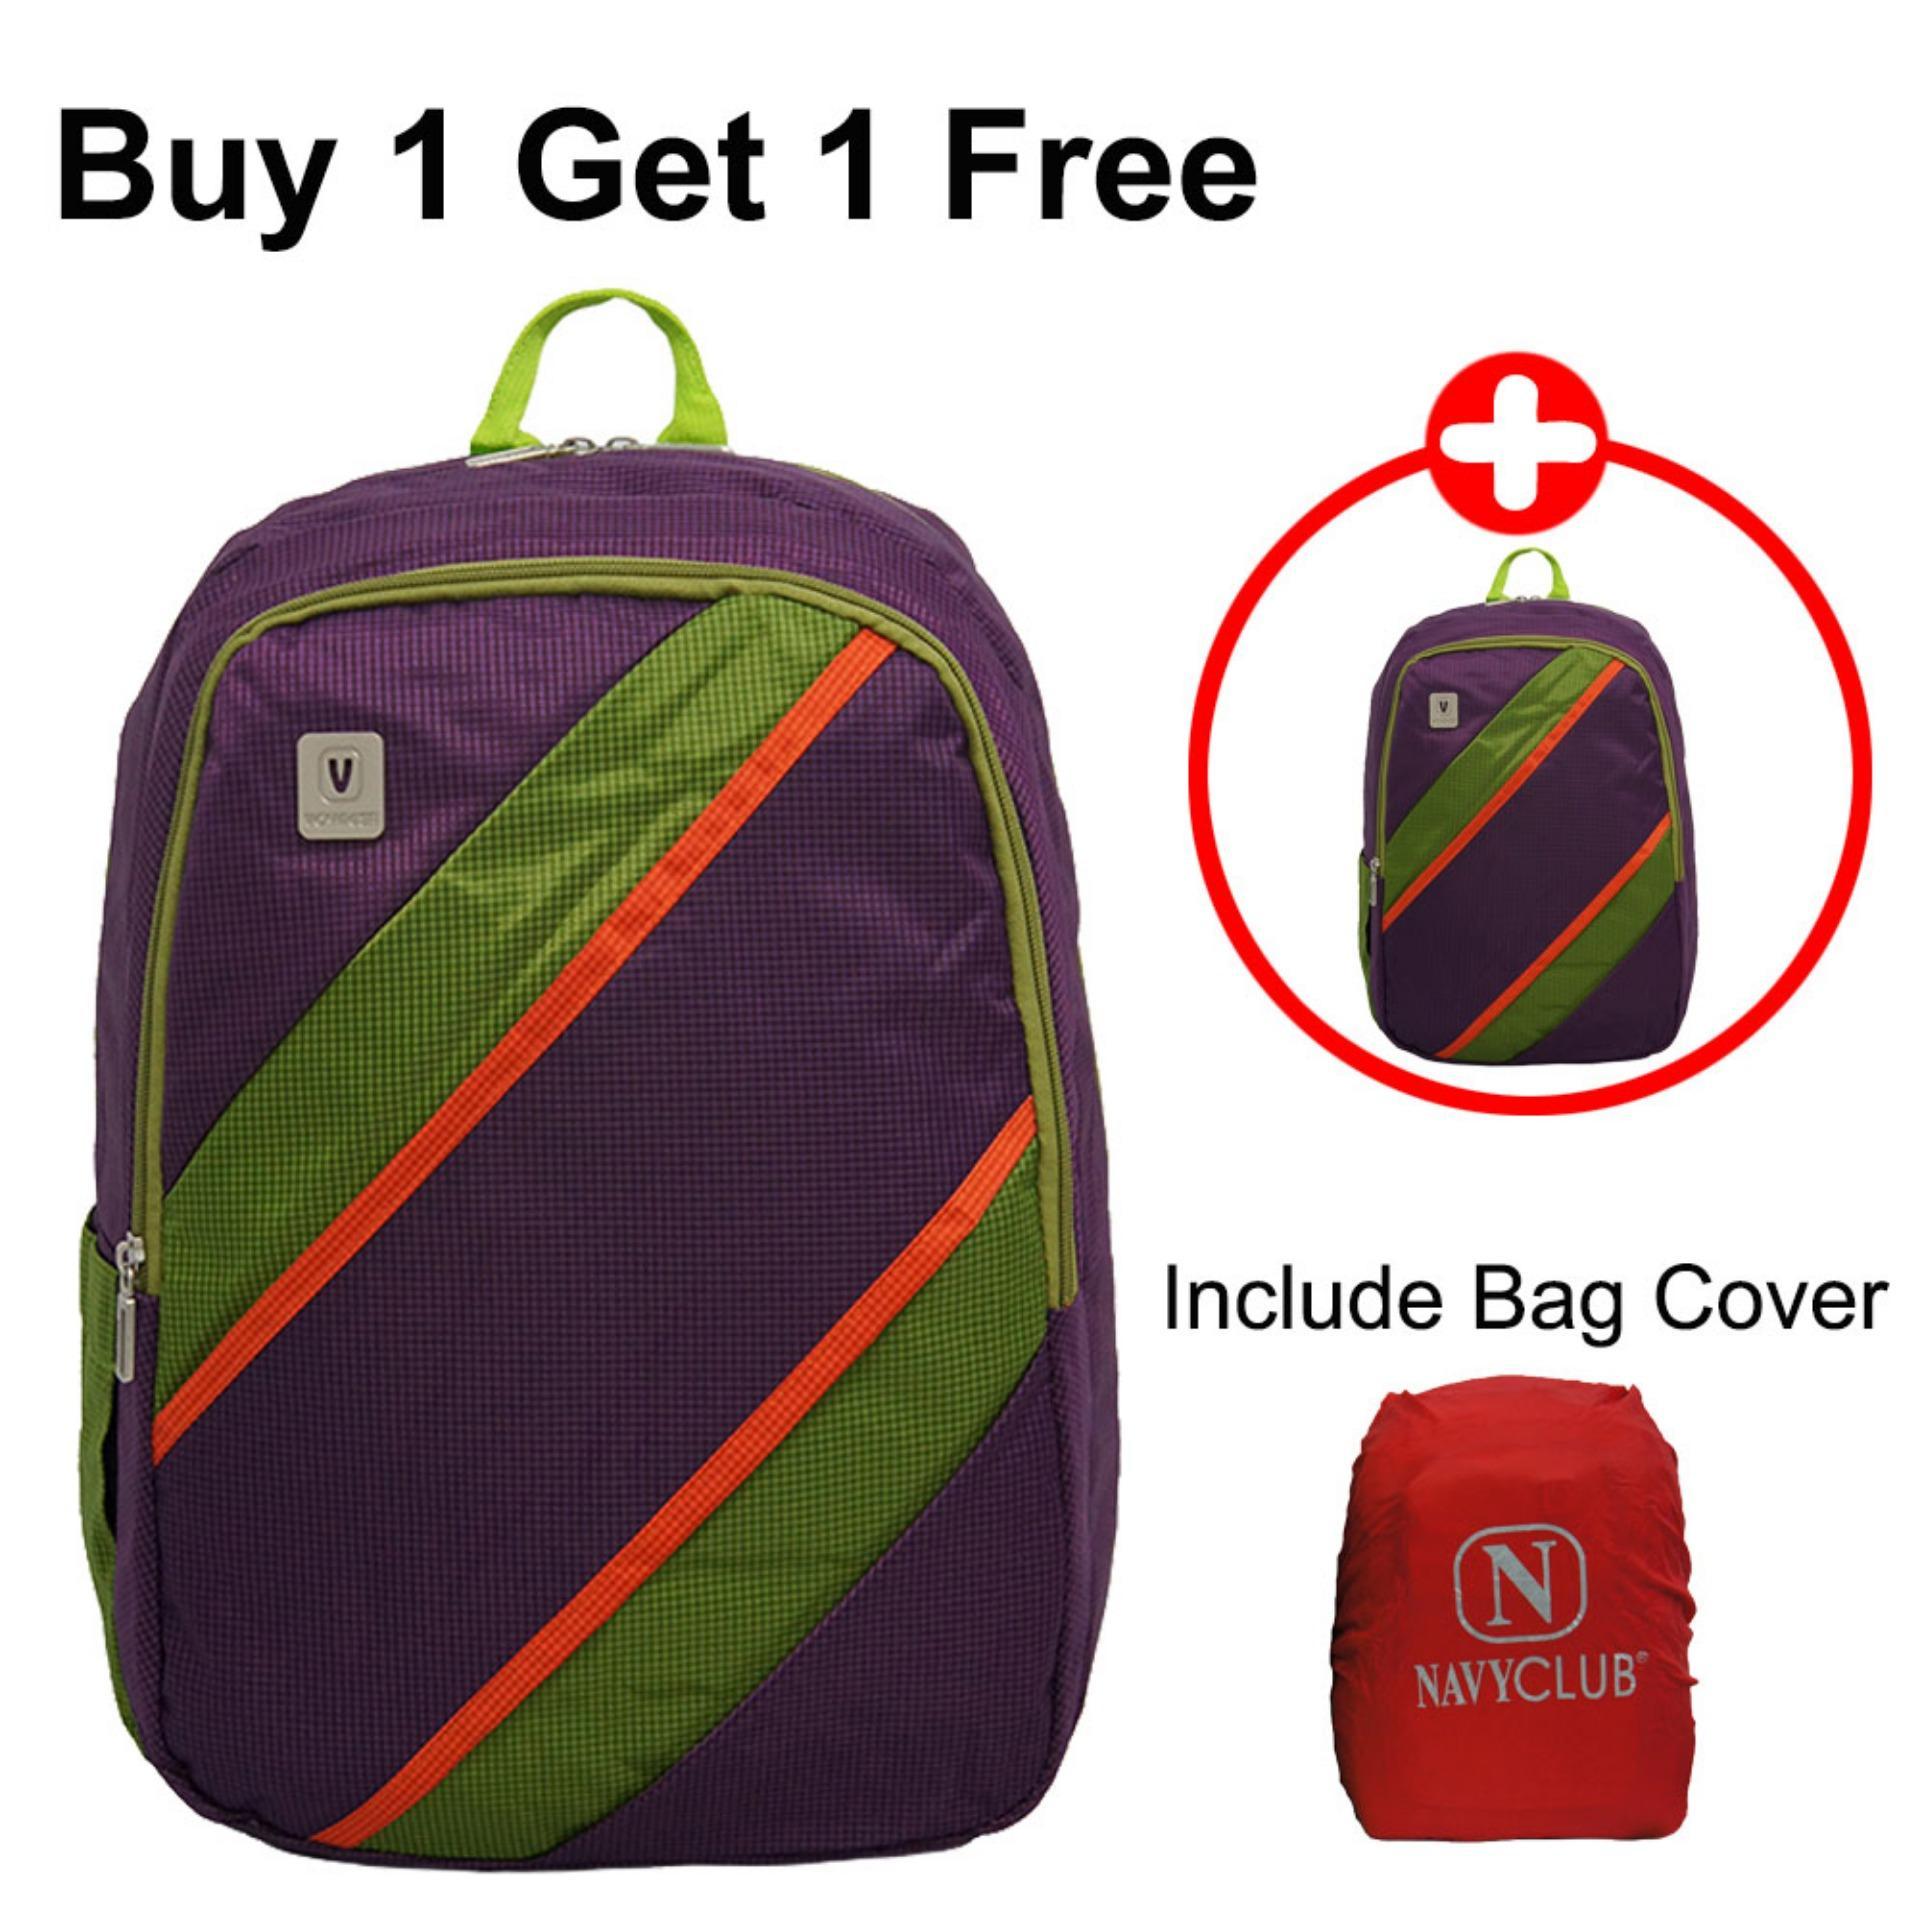 Jual Voyager Tas Ransel Laptop Kasual Tas Pria Tas Wanita 7815 Backpack Bonus Bag Cover Ungu Buy 1 Get 1 Free Voyager